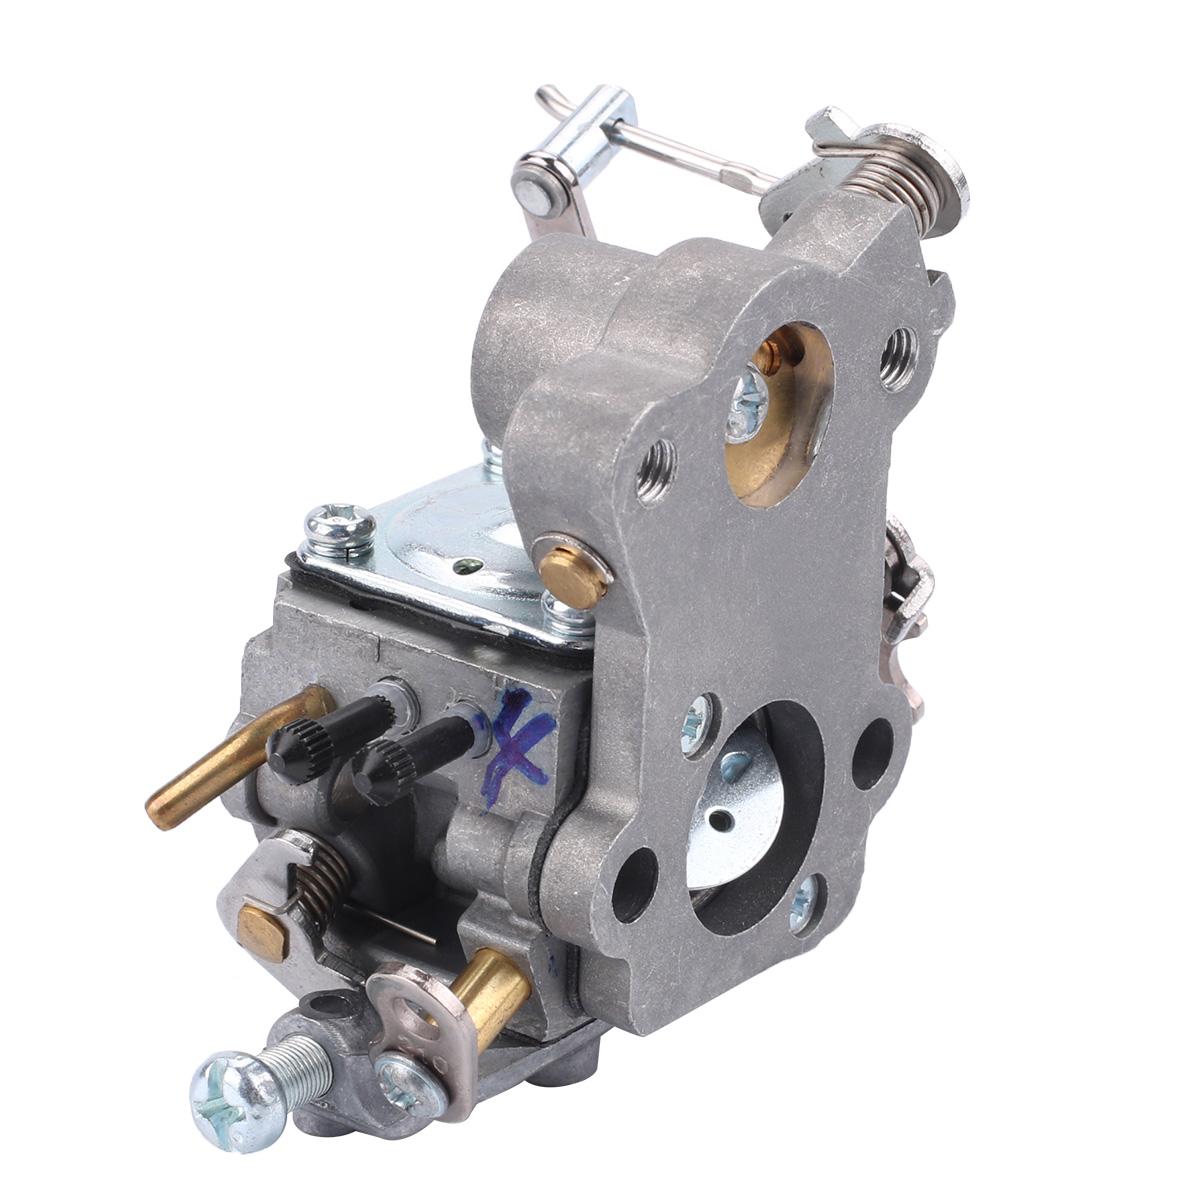 Carburetor Kit For Poulan P3314 P3416 P4018 PP3816 C1M-W26C 545070601 Chainsaw